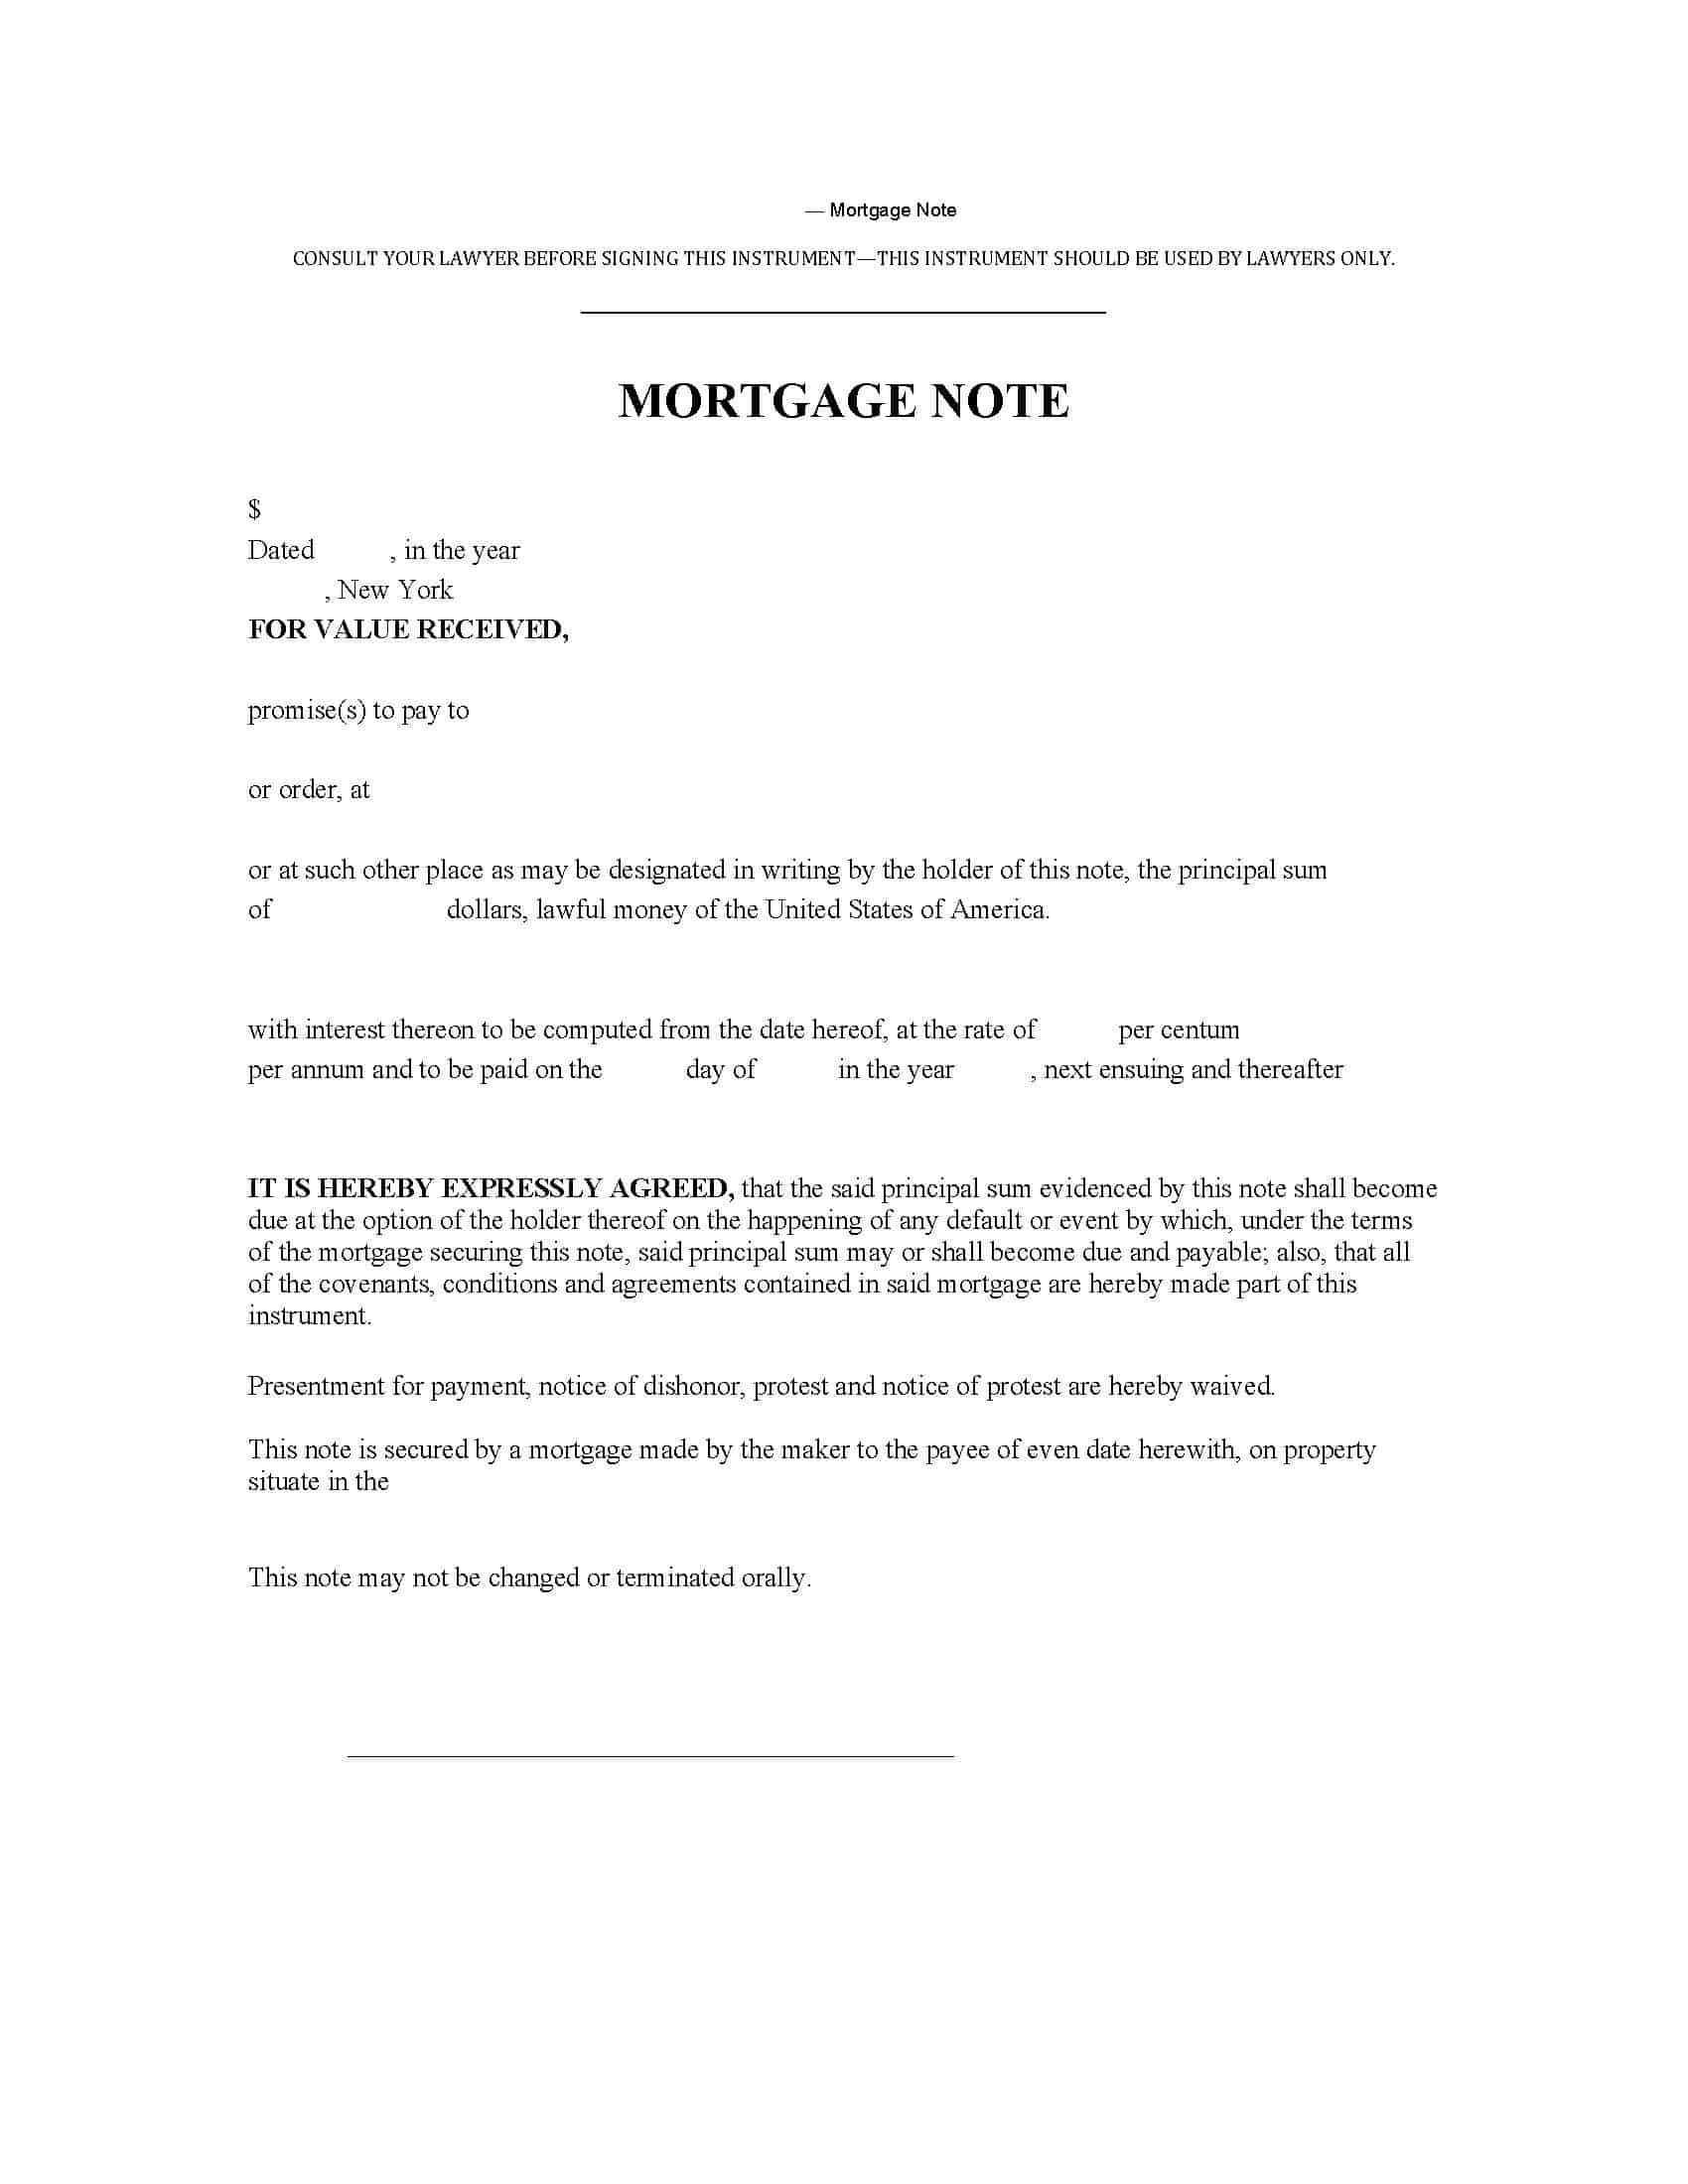 NY Abstract Company Forms | New York Title Insurance